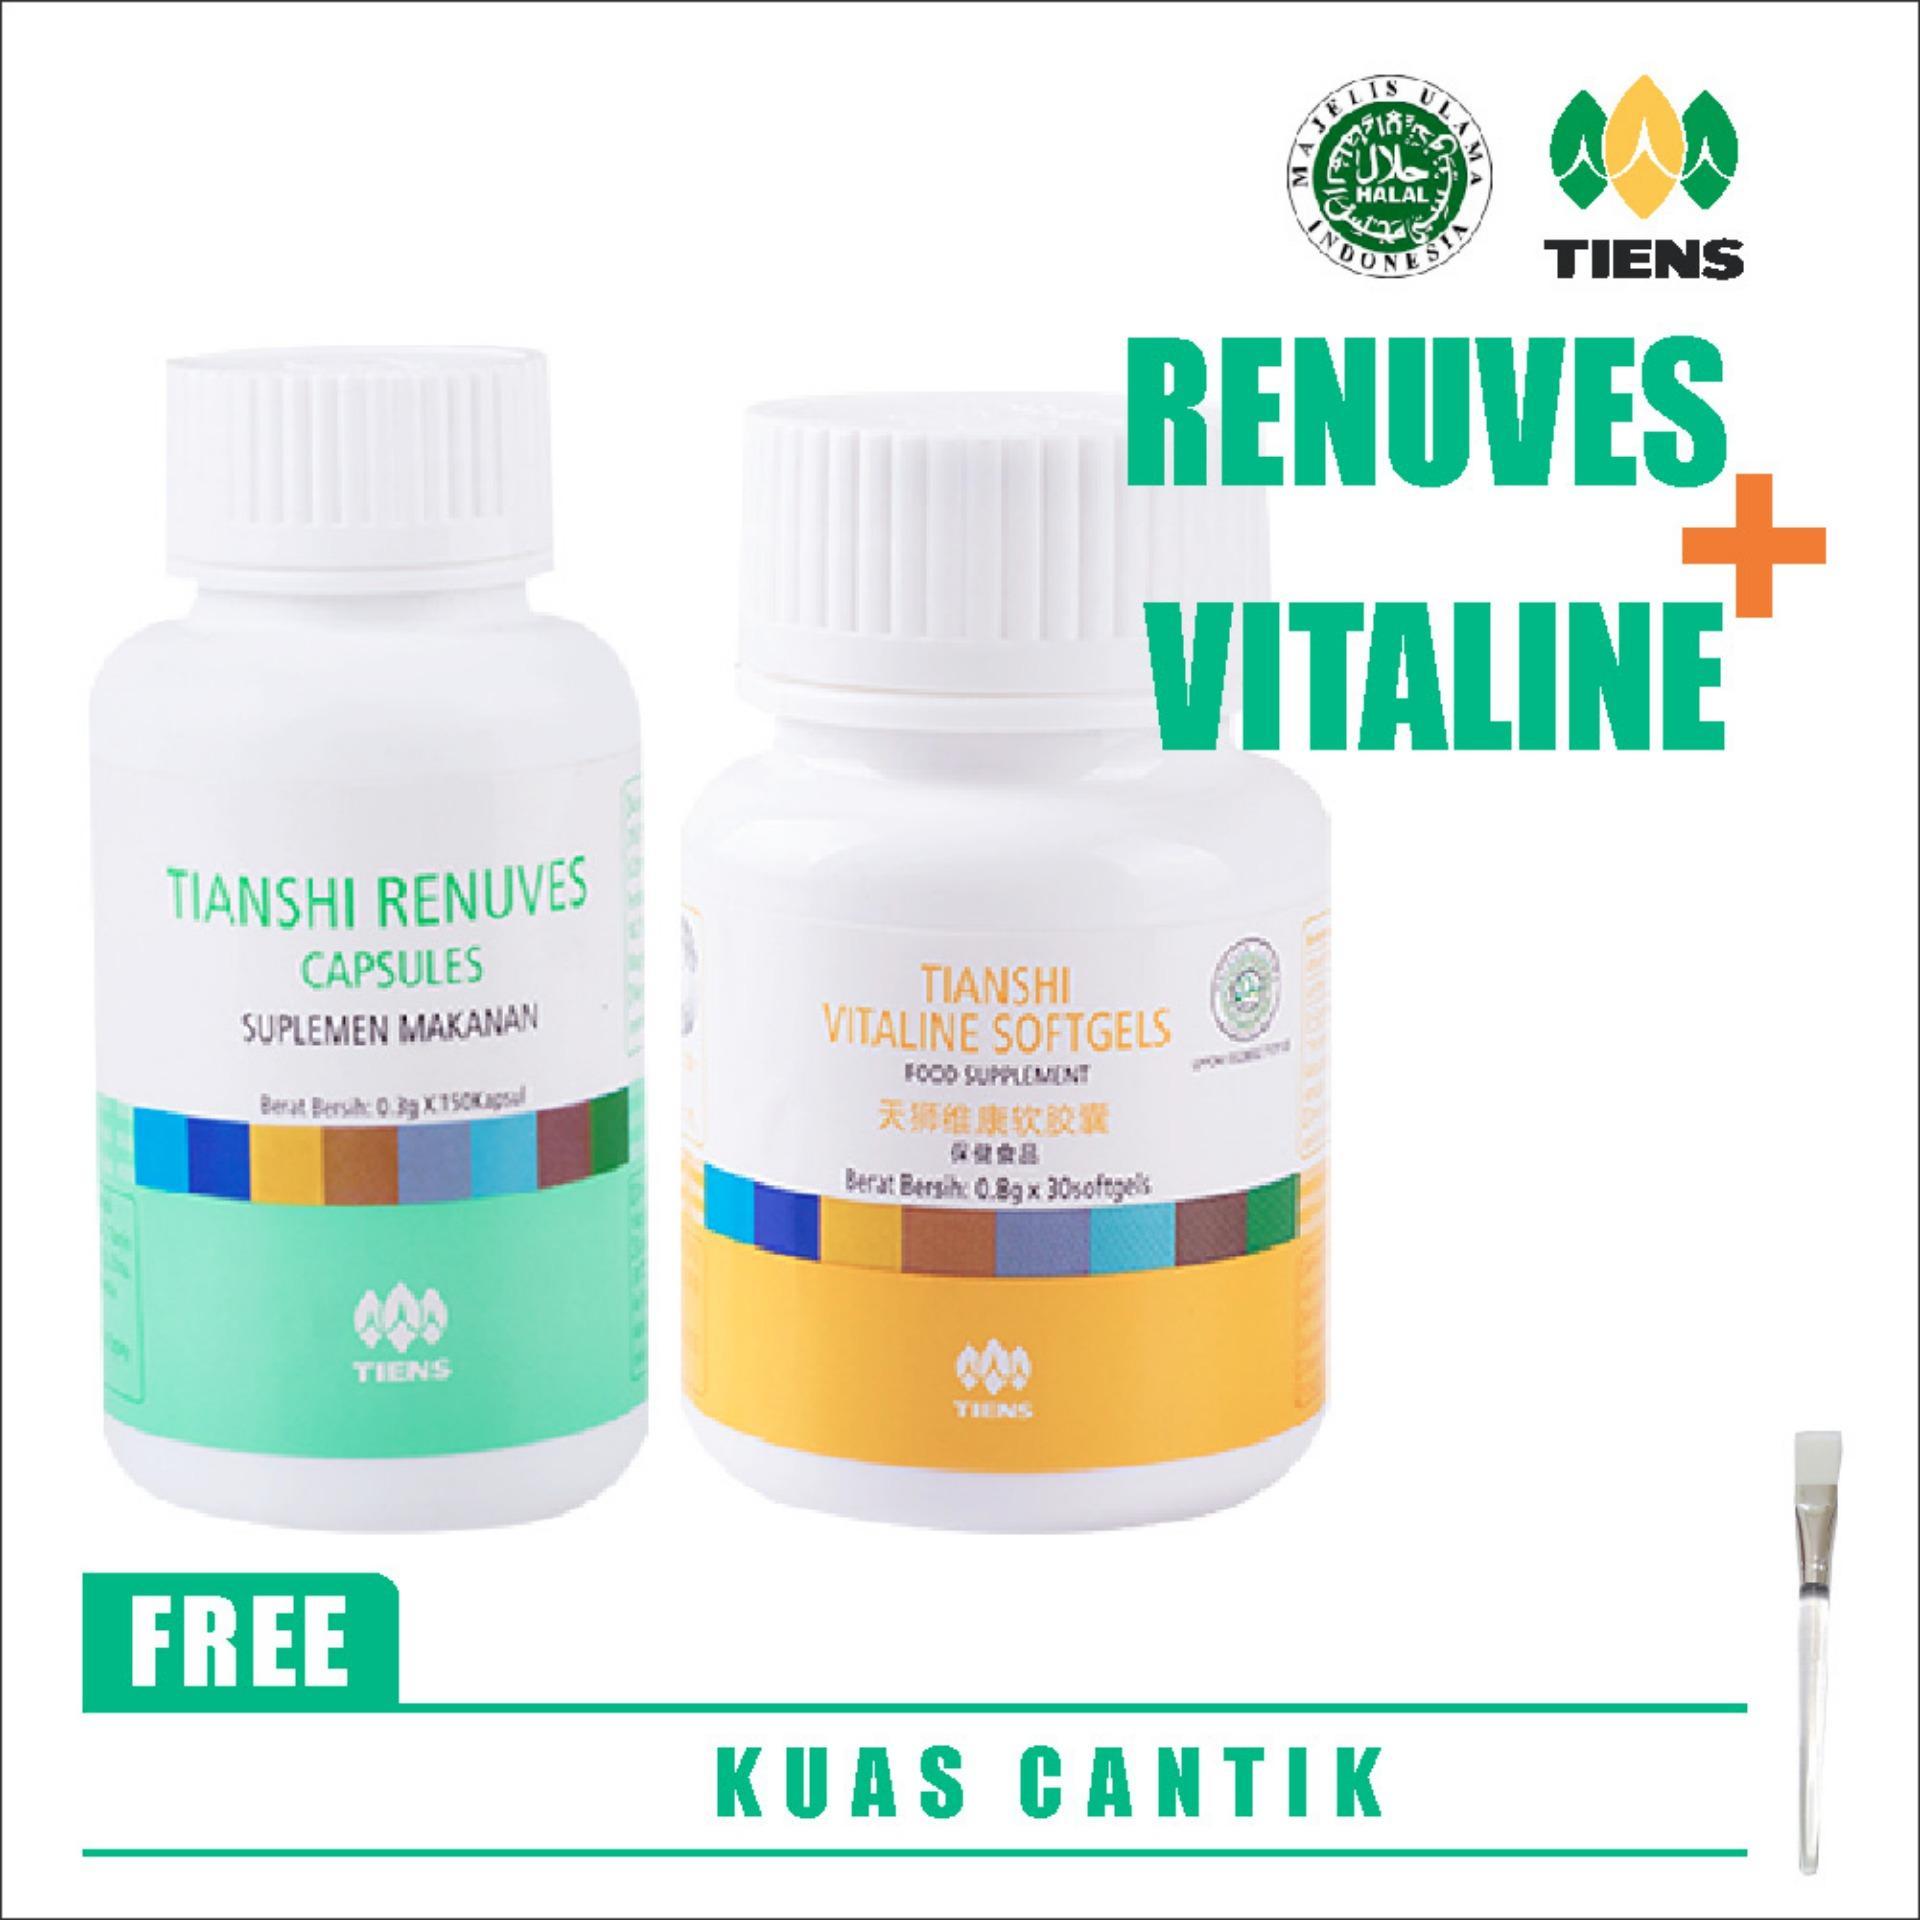 Tiens Pemutih Badan Herbal Paket 1 By Olshop 25 Spirulina Dan Masker  Ter Basic Free Kuas Vitaline Renuves Tianshi